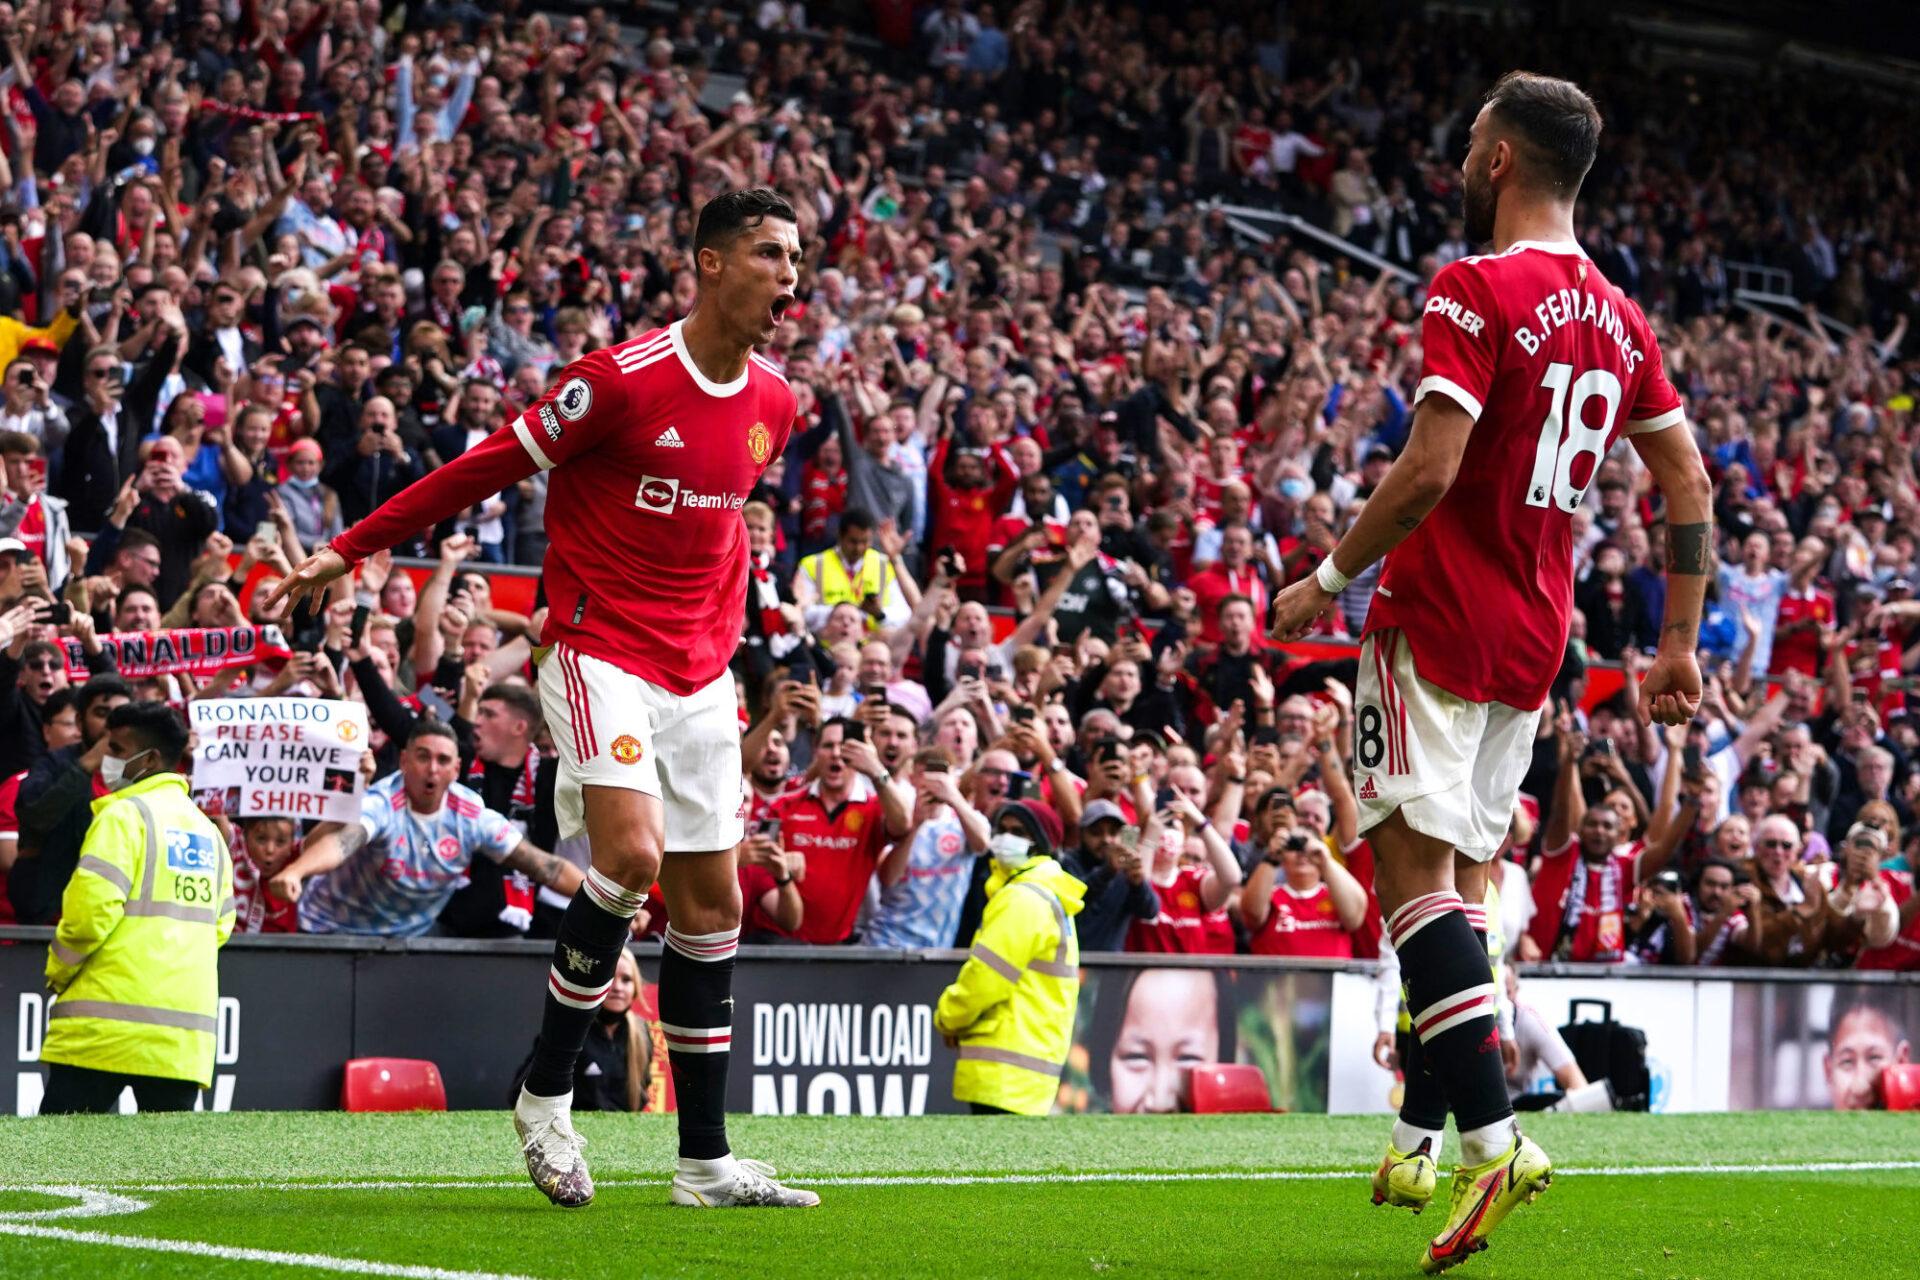 Cristiano Ronaldo célèbre son ouverture du score. Icon Sport